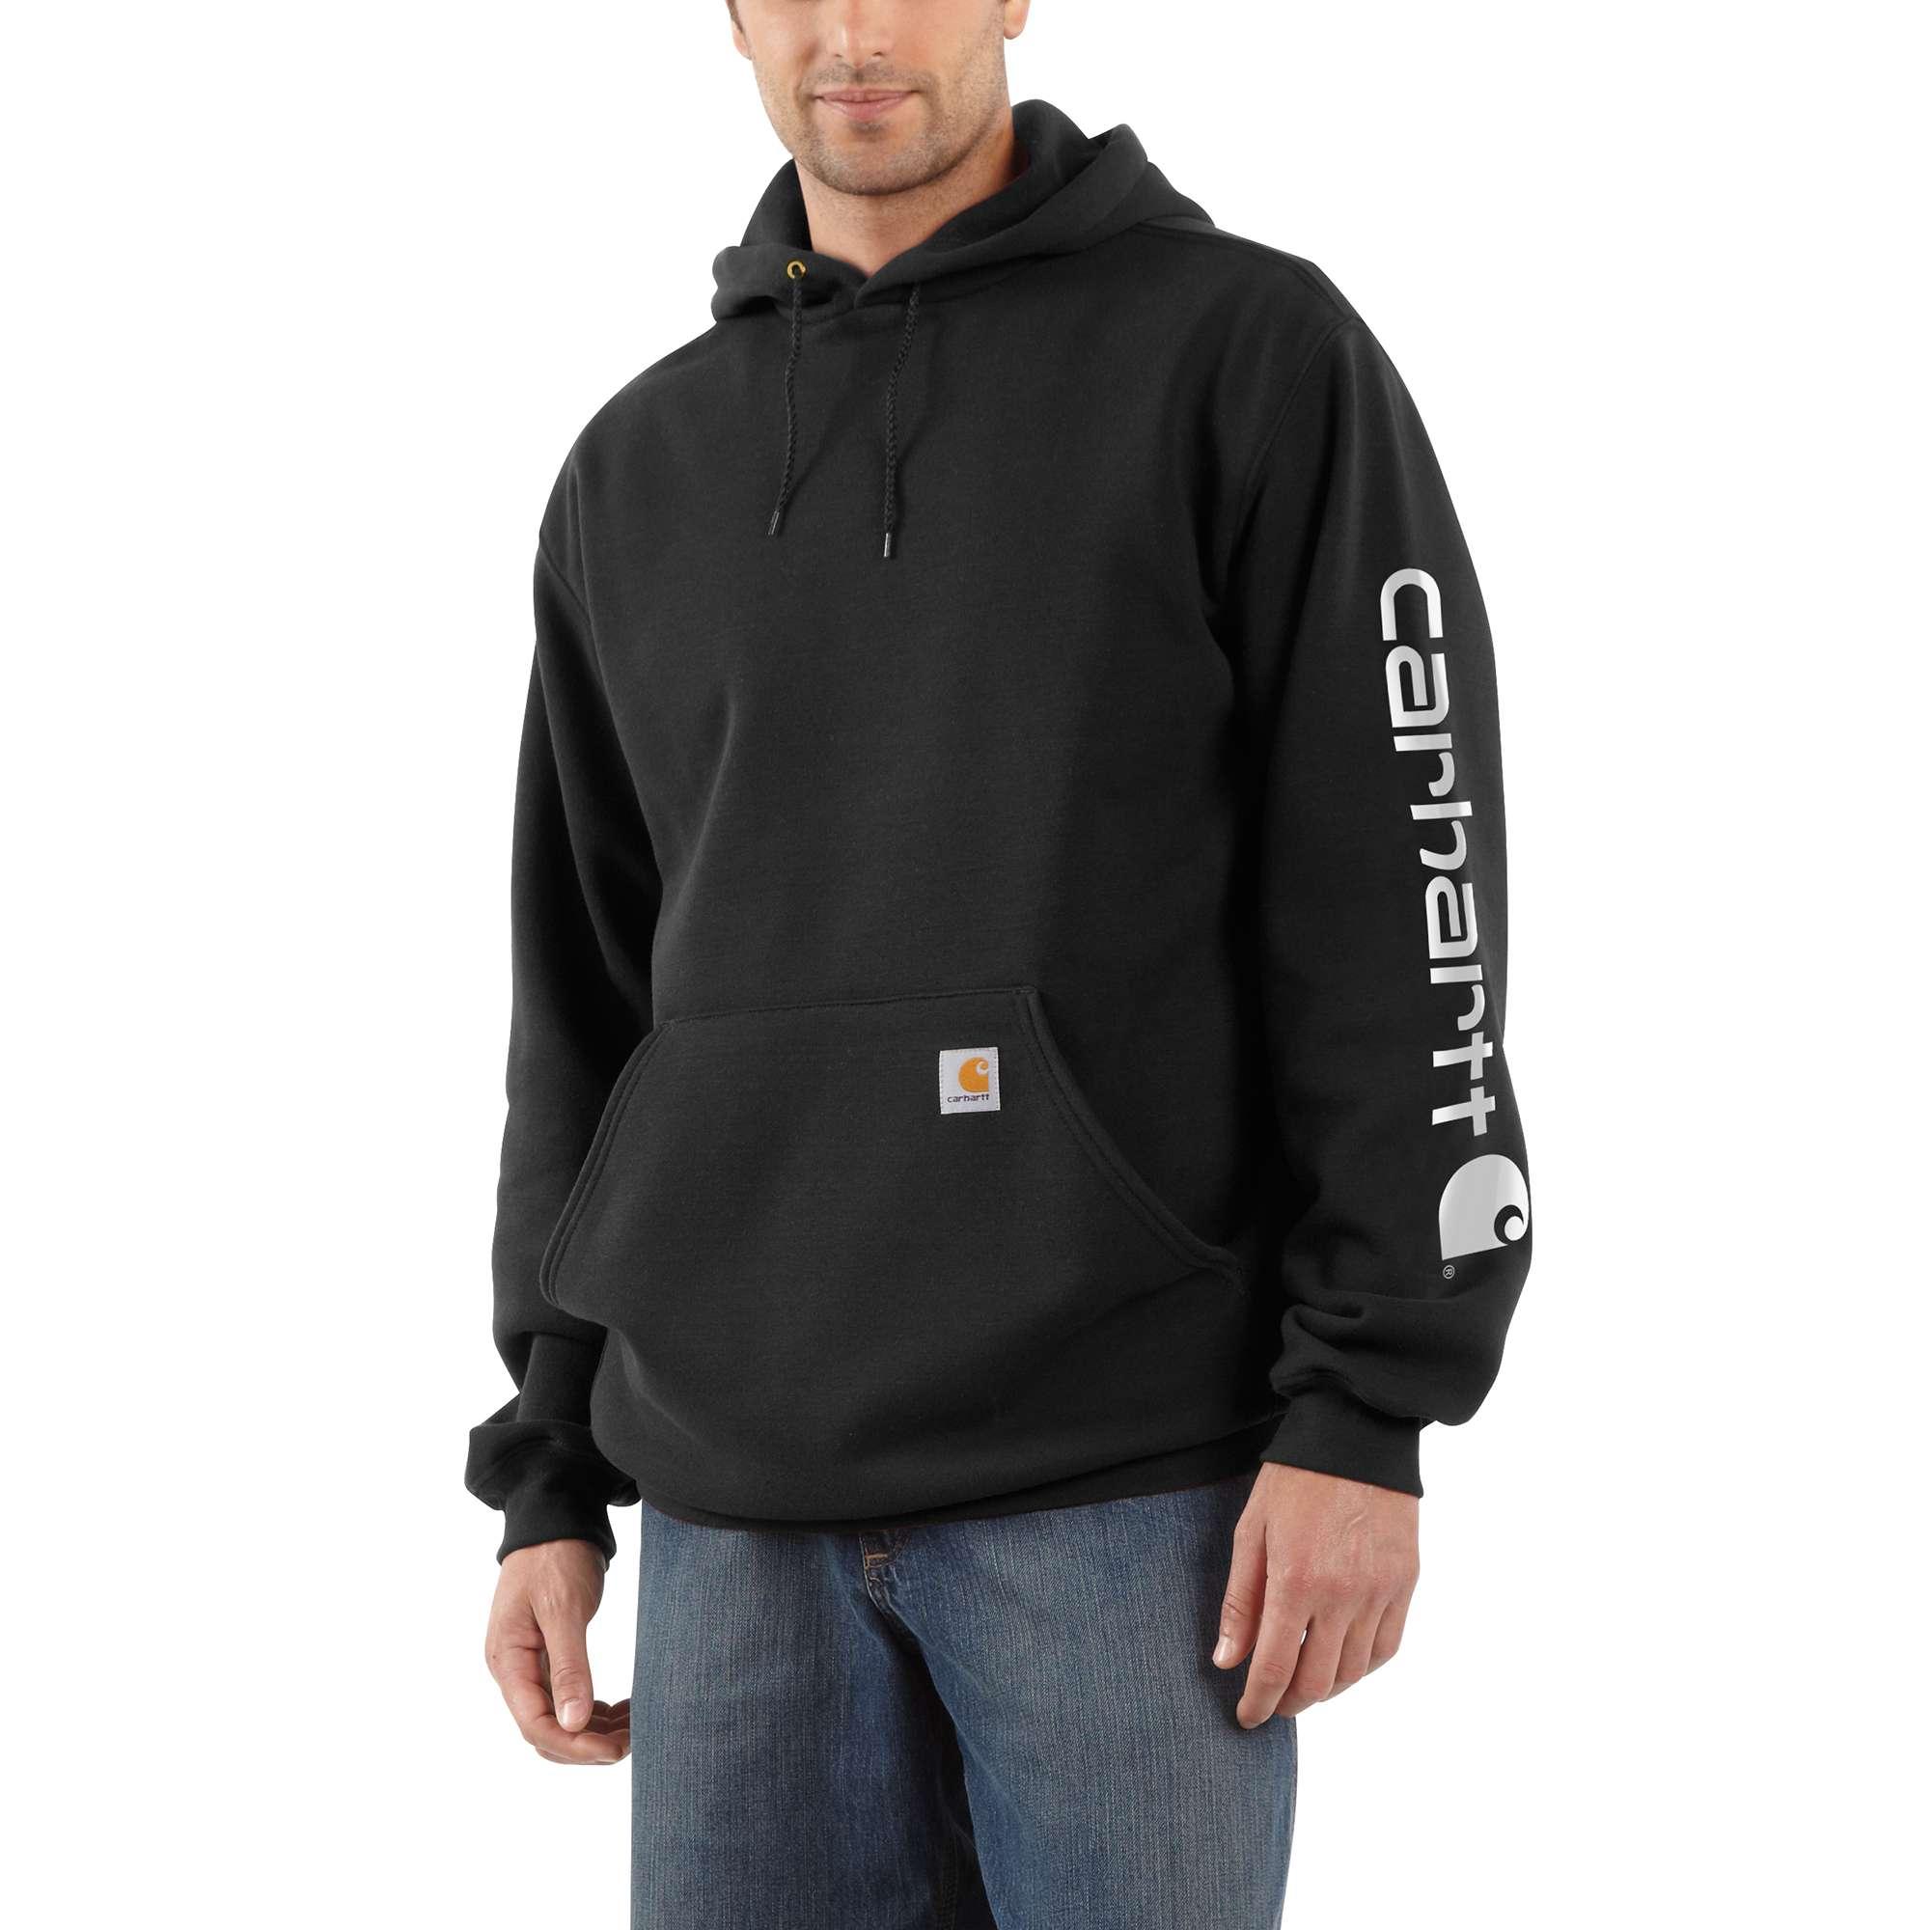 Men's Midweight Signature Logo Sleeve Hooded Sweatshirt, Black, swatch